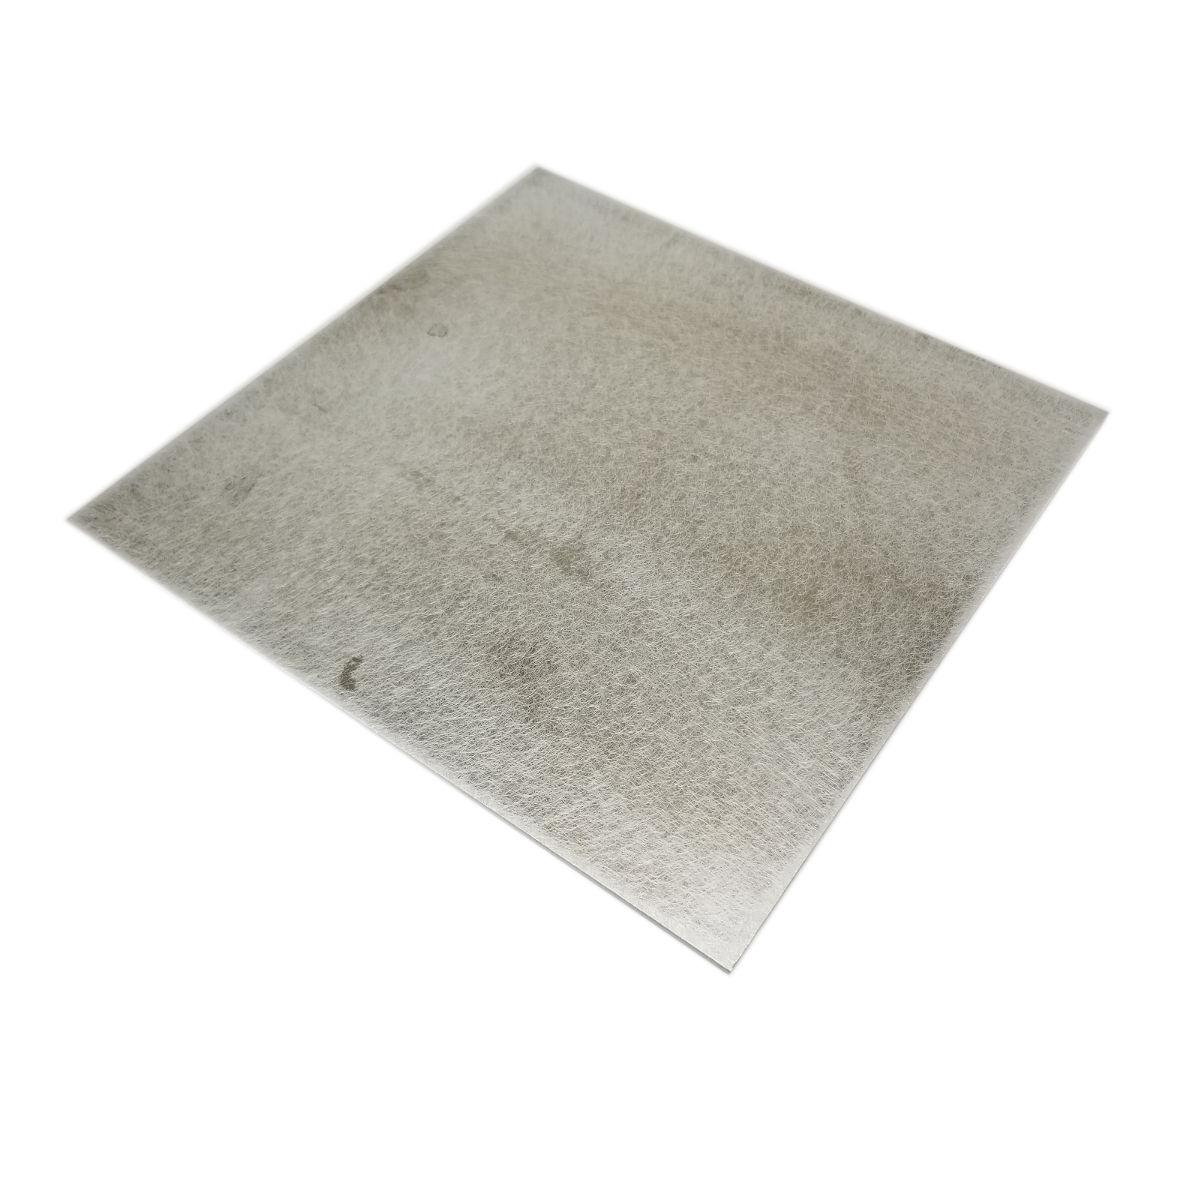 5052 Aluminum Plate - 3D Printing Canada